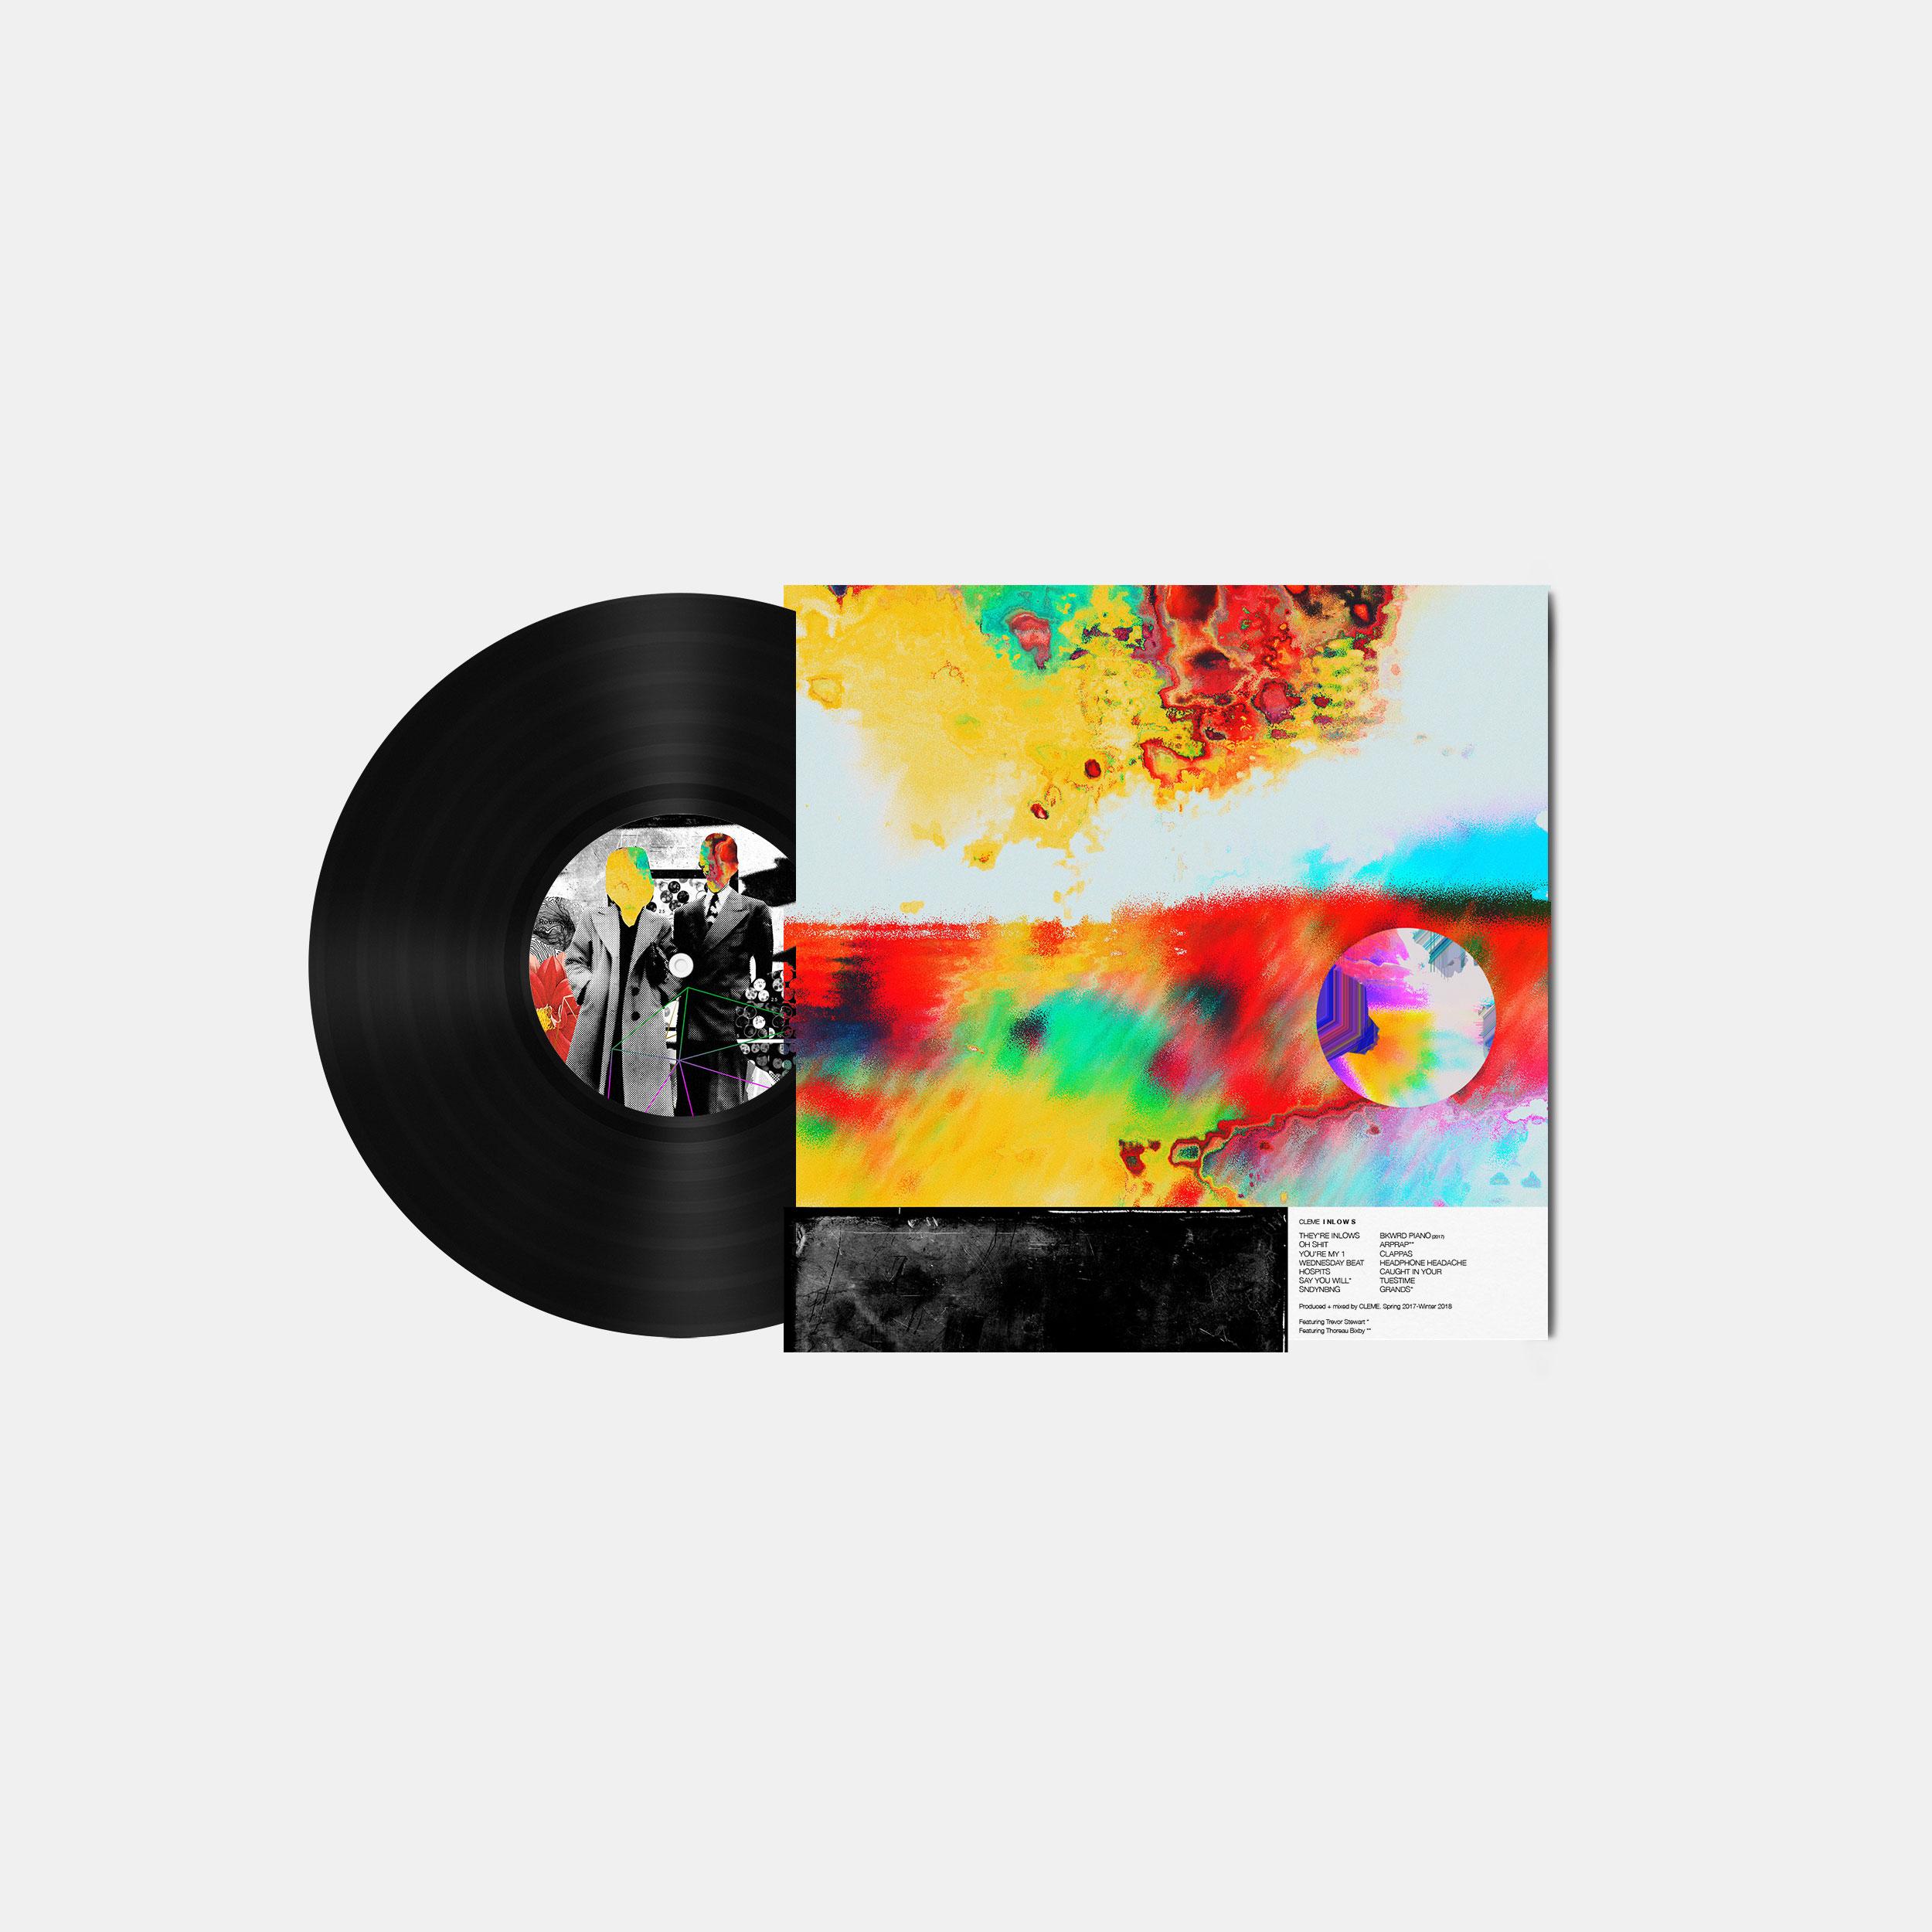 Vinyl-Disc-Mockup-back.jpg